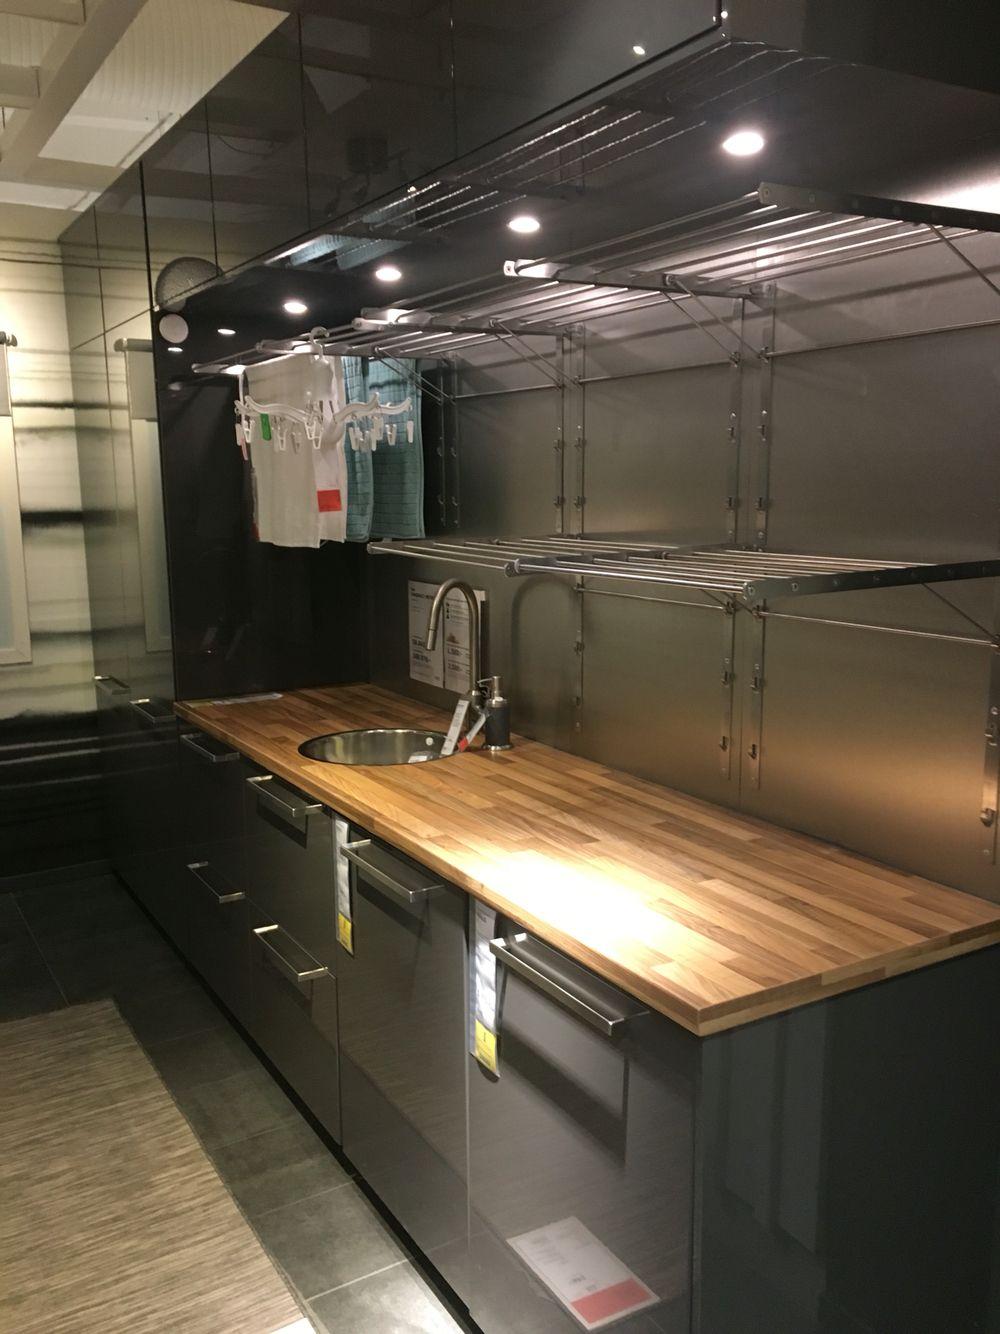 Best Ikea Ringhult Grey Ikea Inspiration Kitchen Home Reno 400 x 300